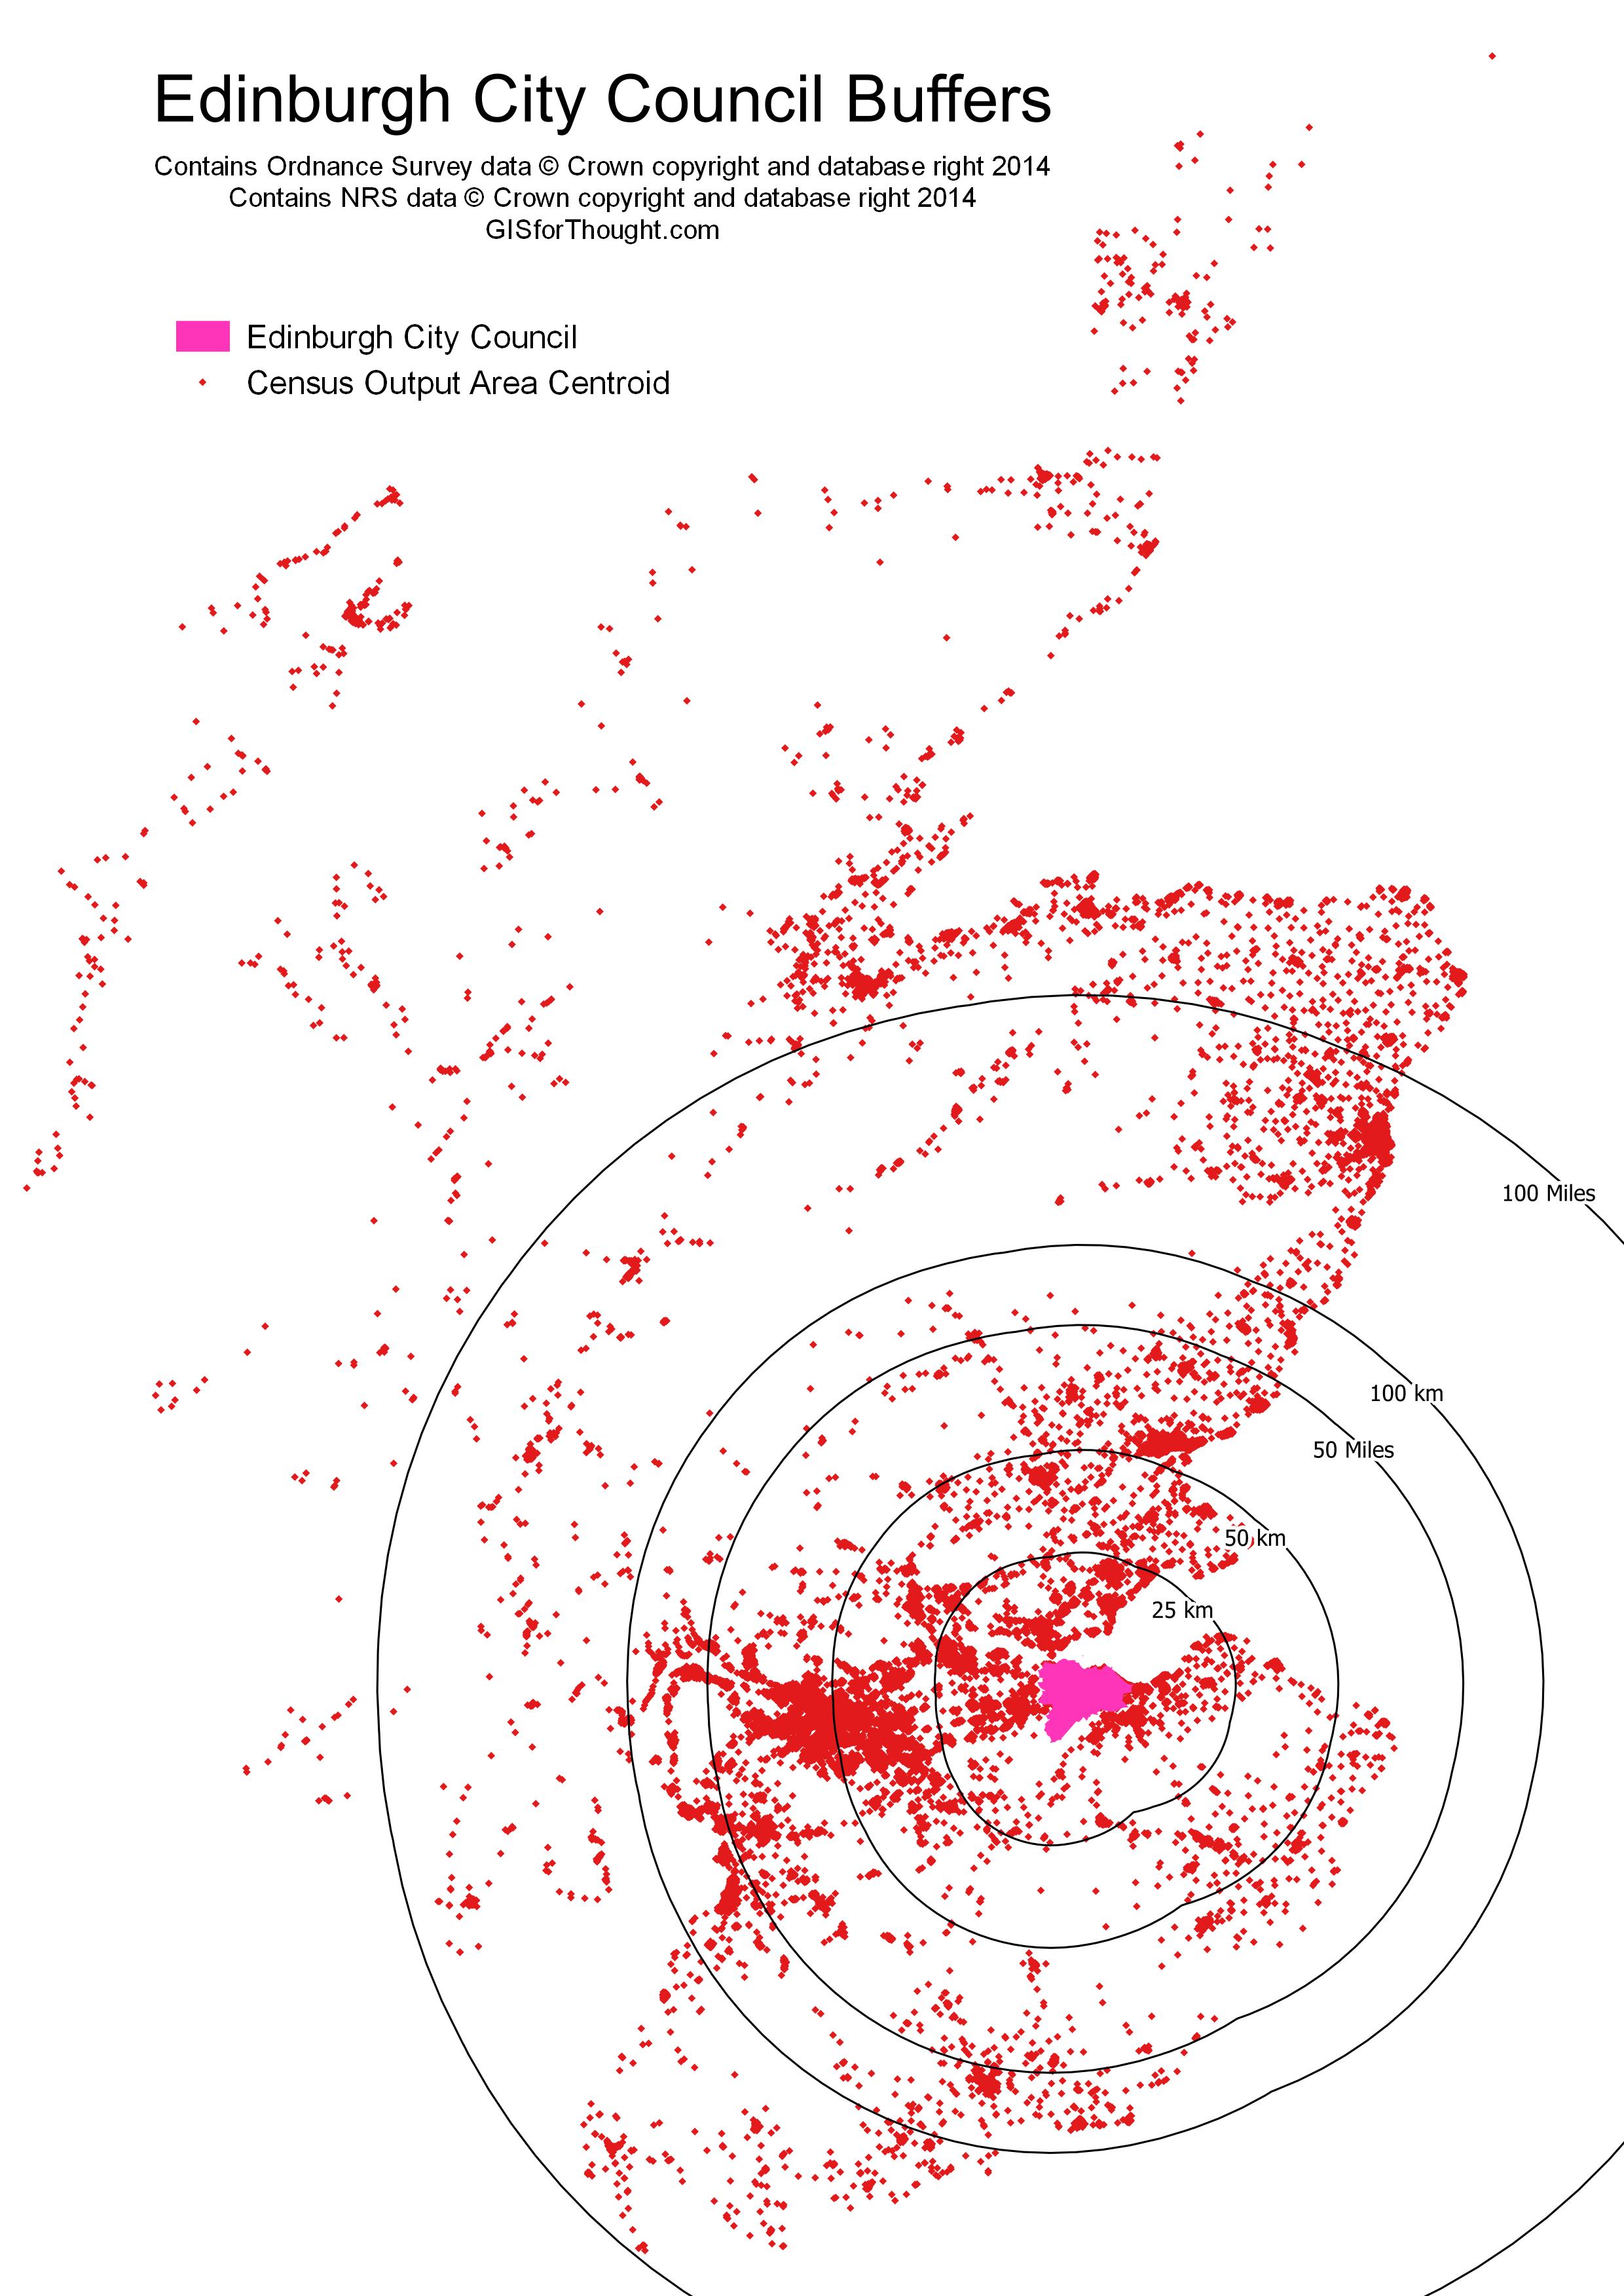 Population buffers around Edinburgh